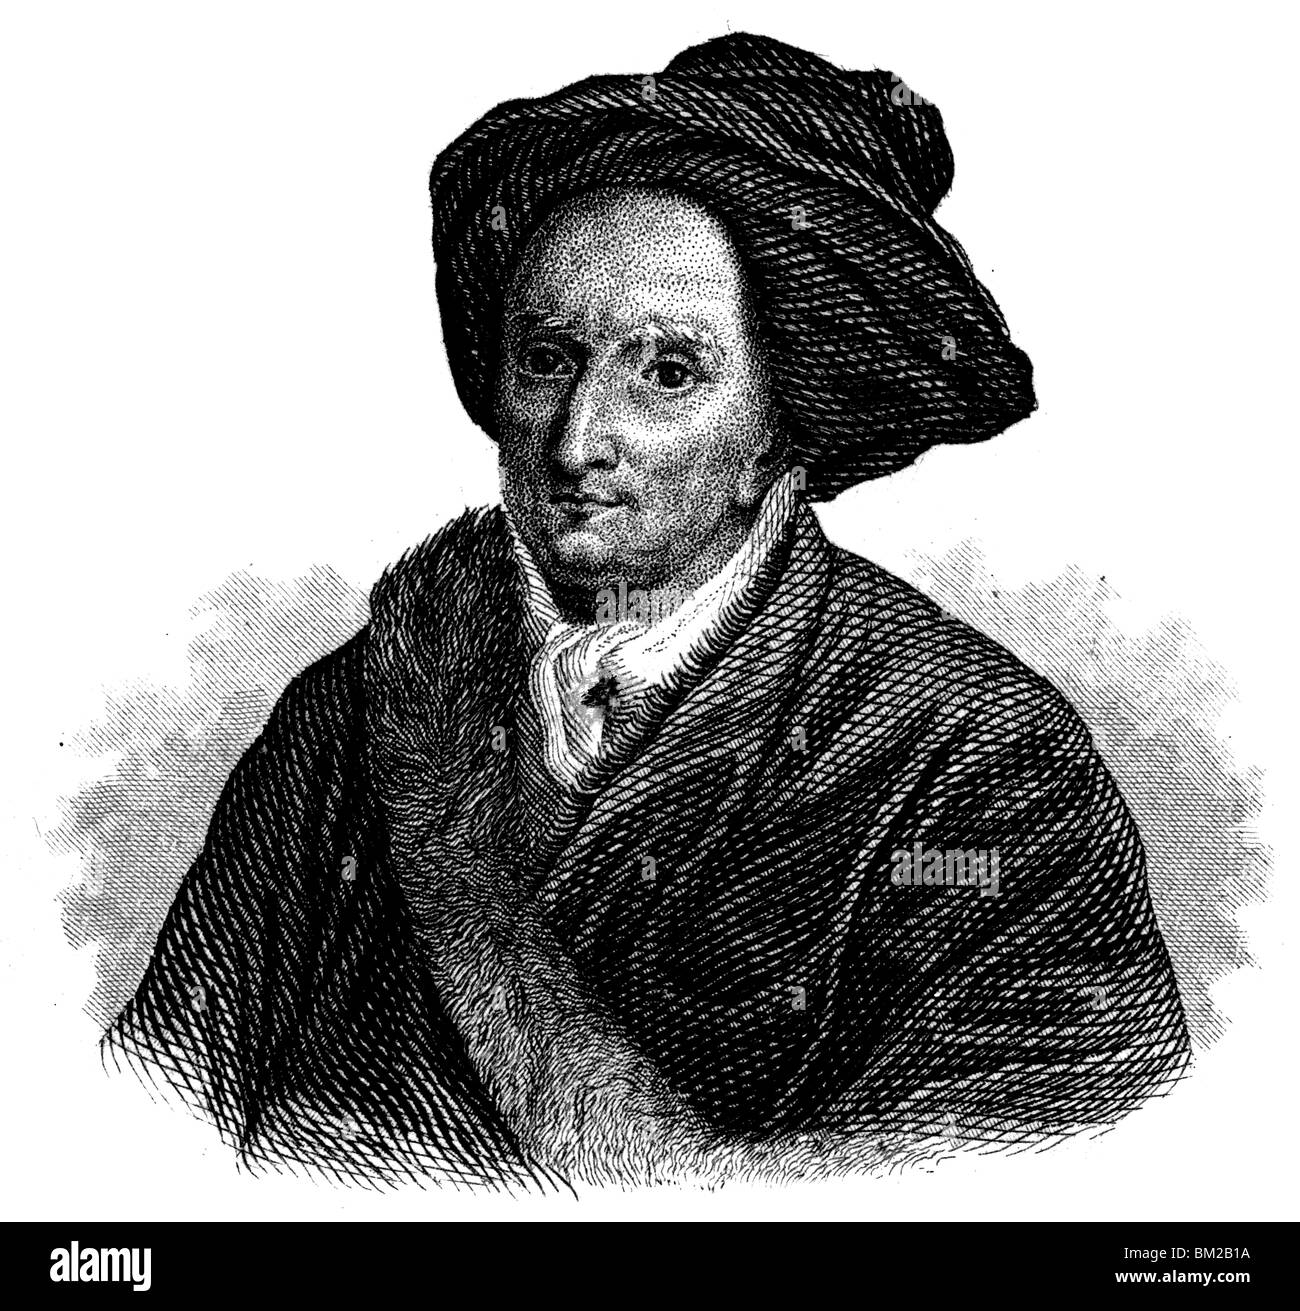 Bernard le Bovier de Fontenelle Stock Photo